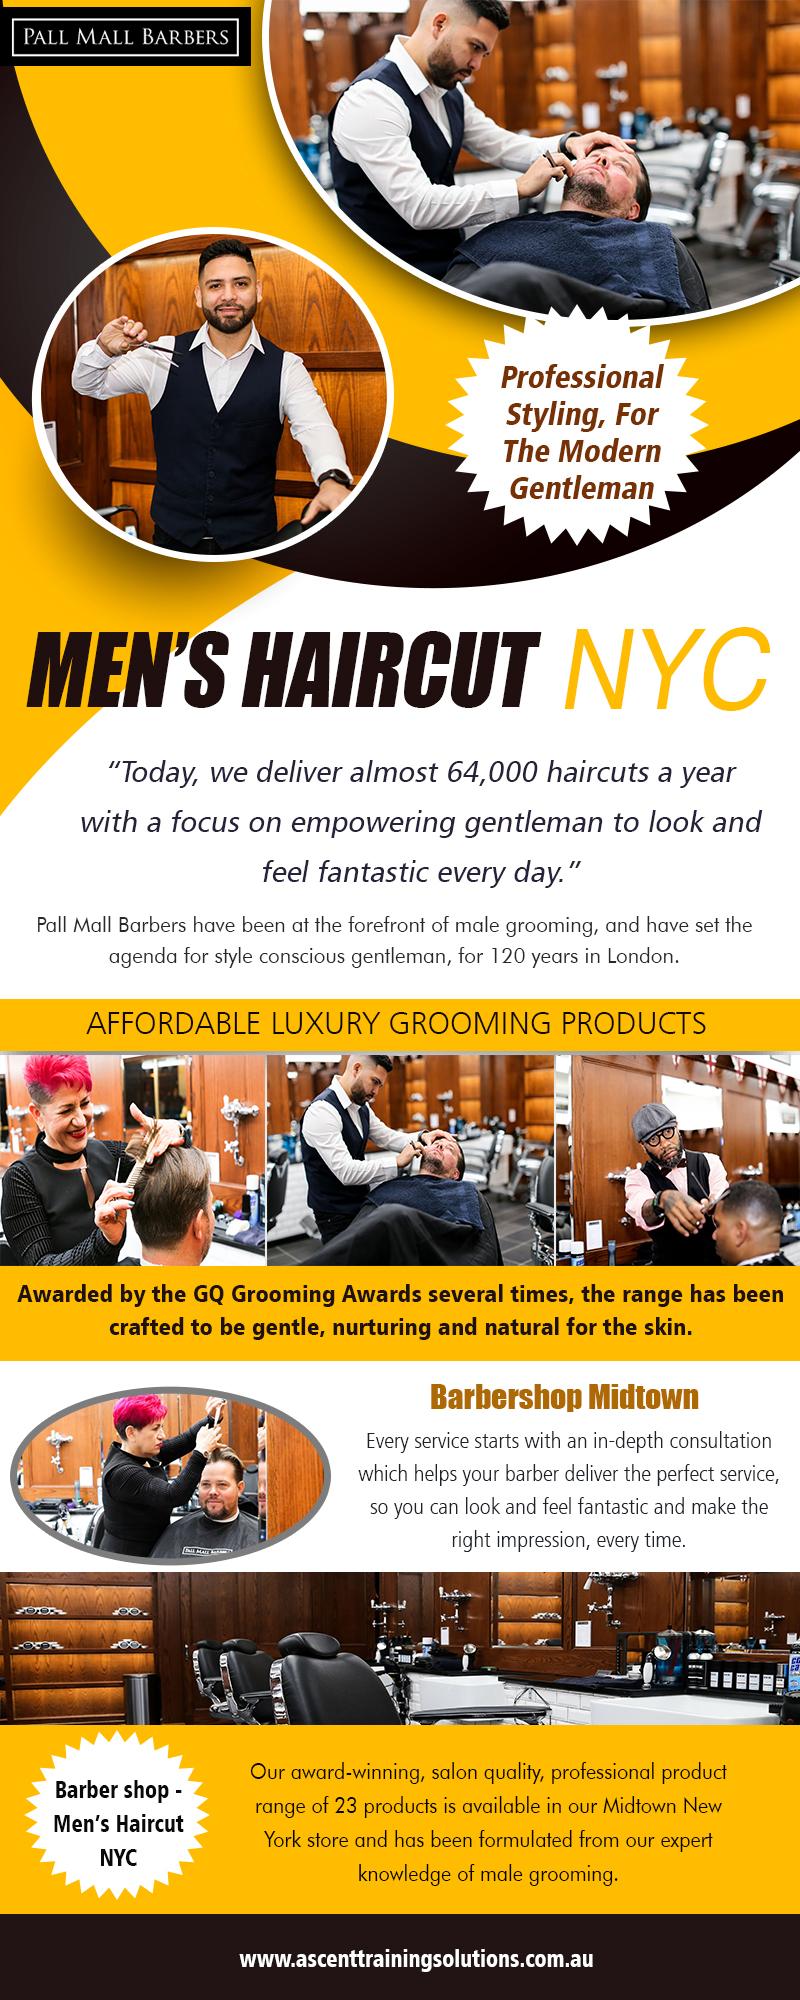 Men's Haircut NYC